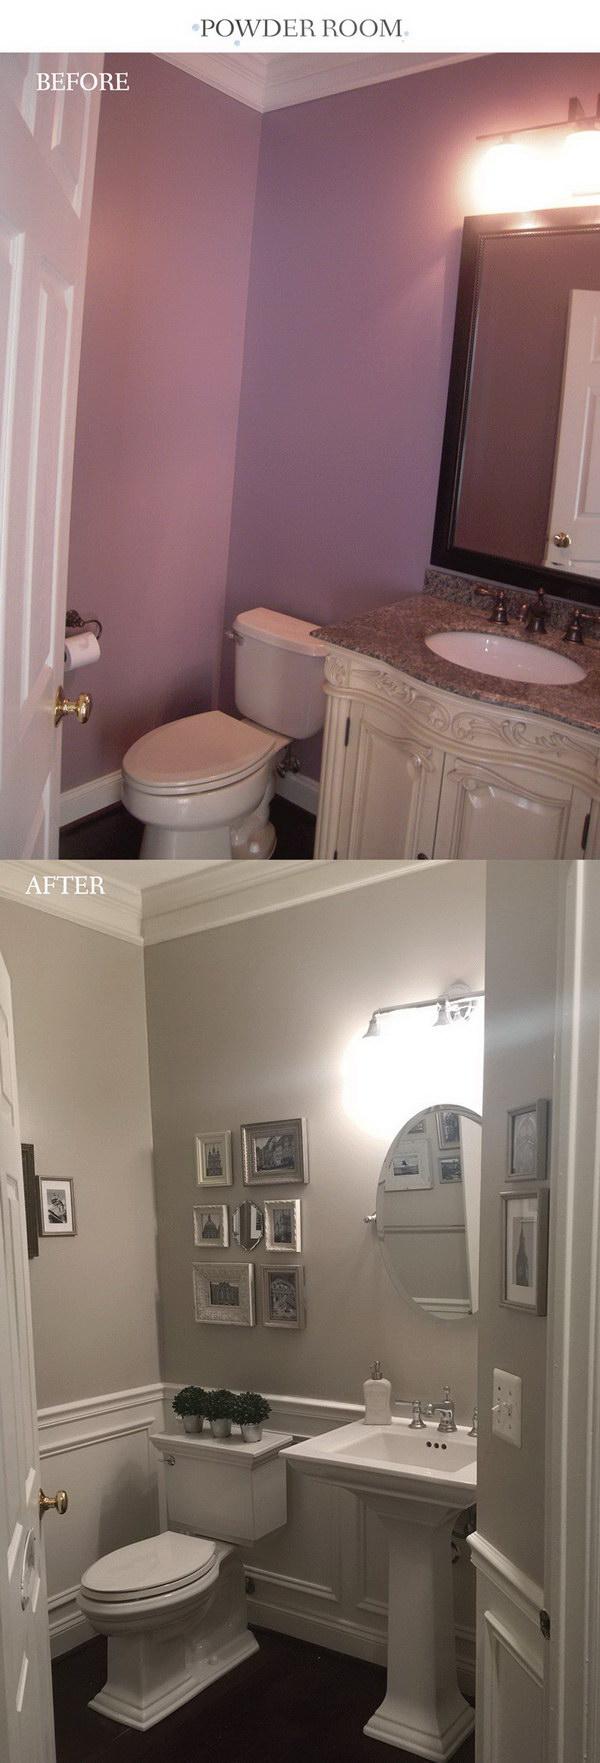 5-bathroom-remodeling-ideas